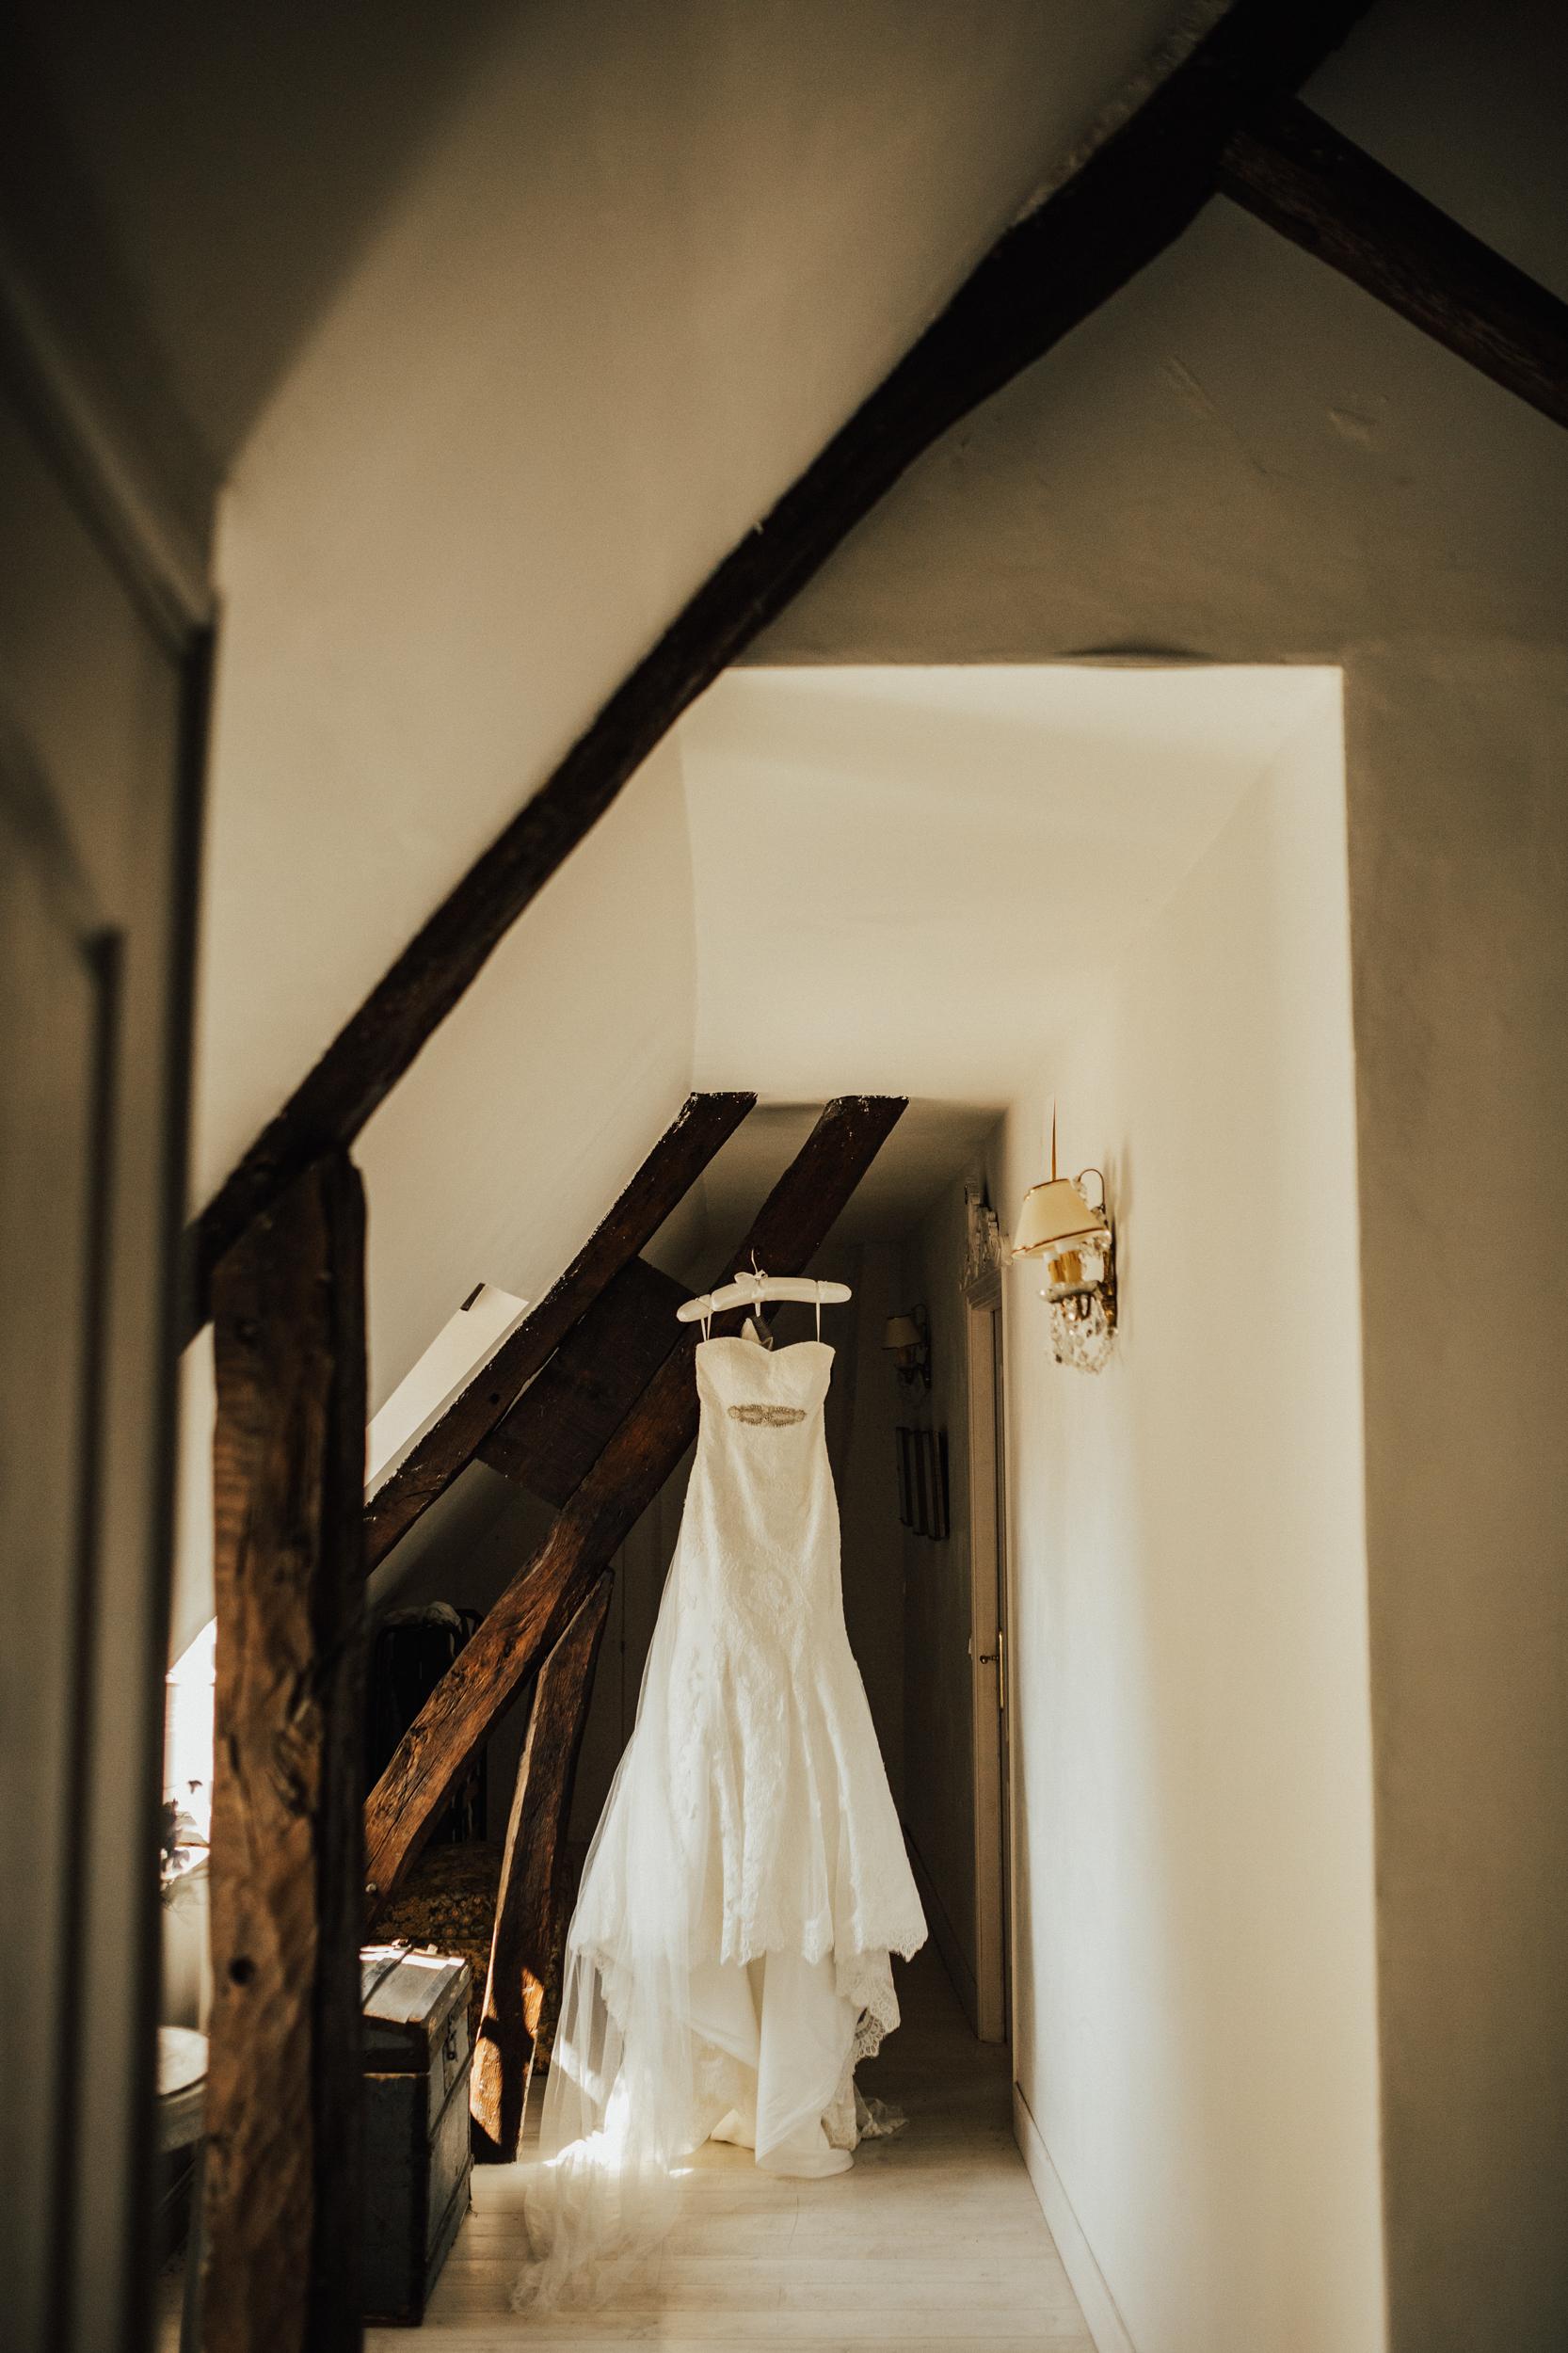 Amy-Zac-Destination-Wedding-France-Manoir-Foulquetiere-Darina-Stoda-Photography-18.jpg